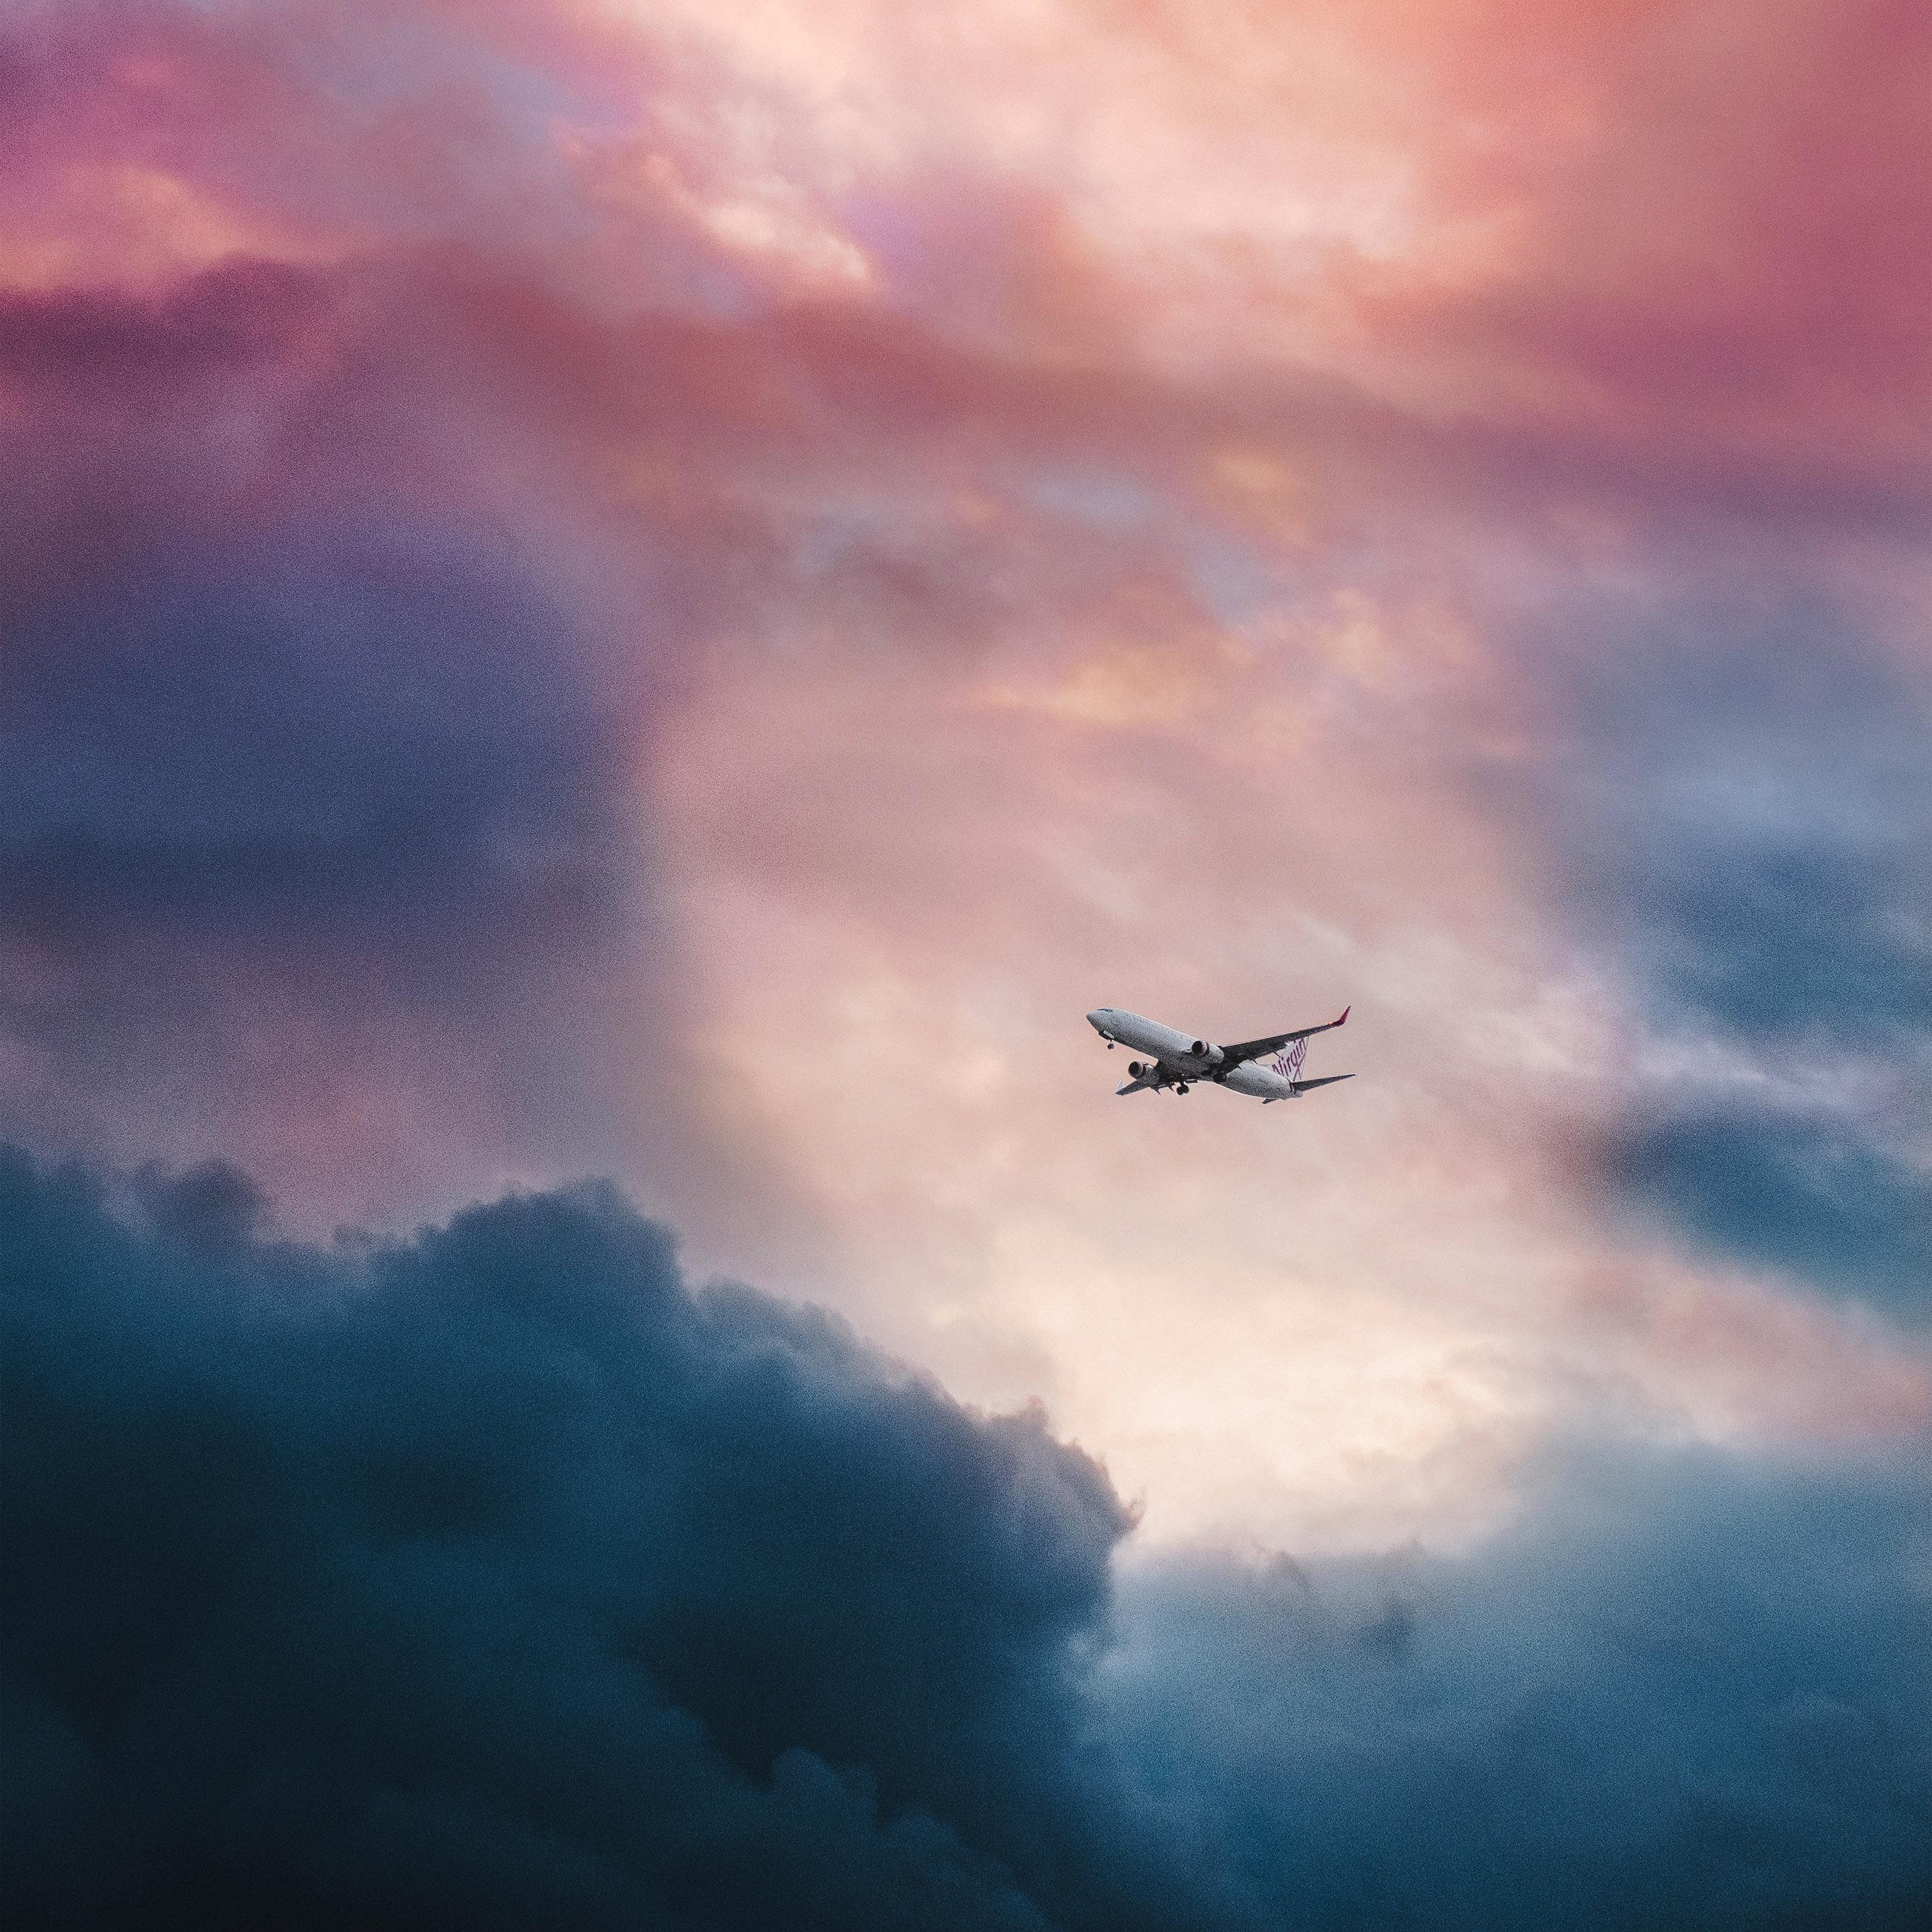 Best Apple Logo Iphone Wallpaper: Nv09-cloud-plane-fly-sky-nature-wallpaper